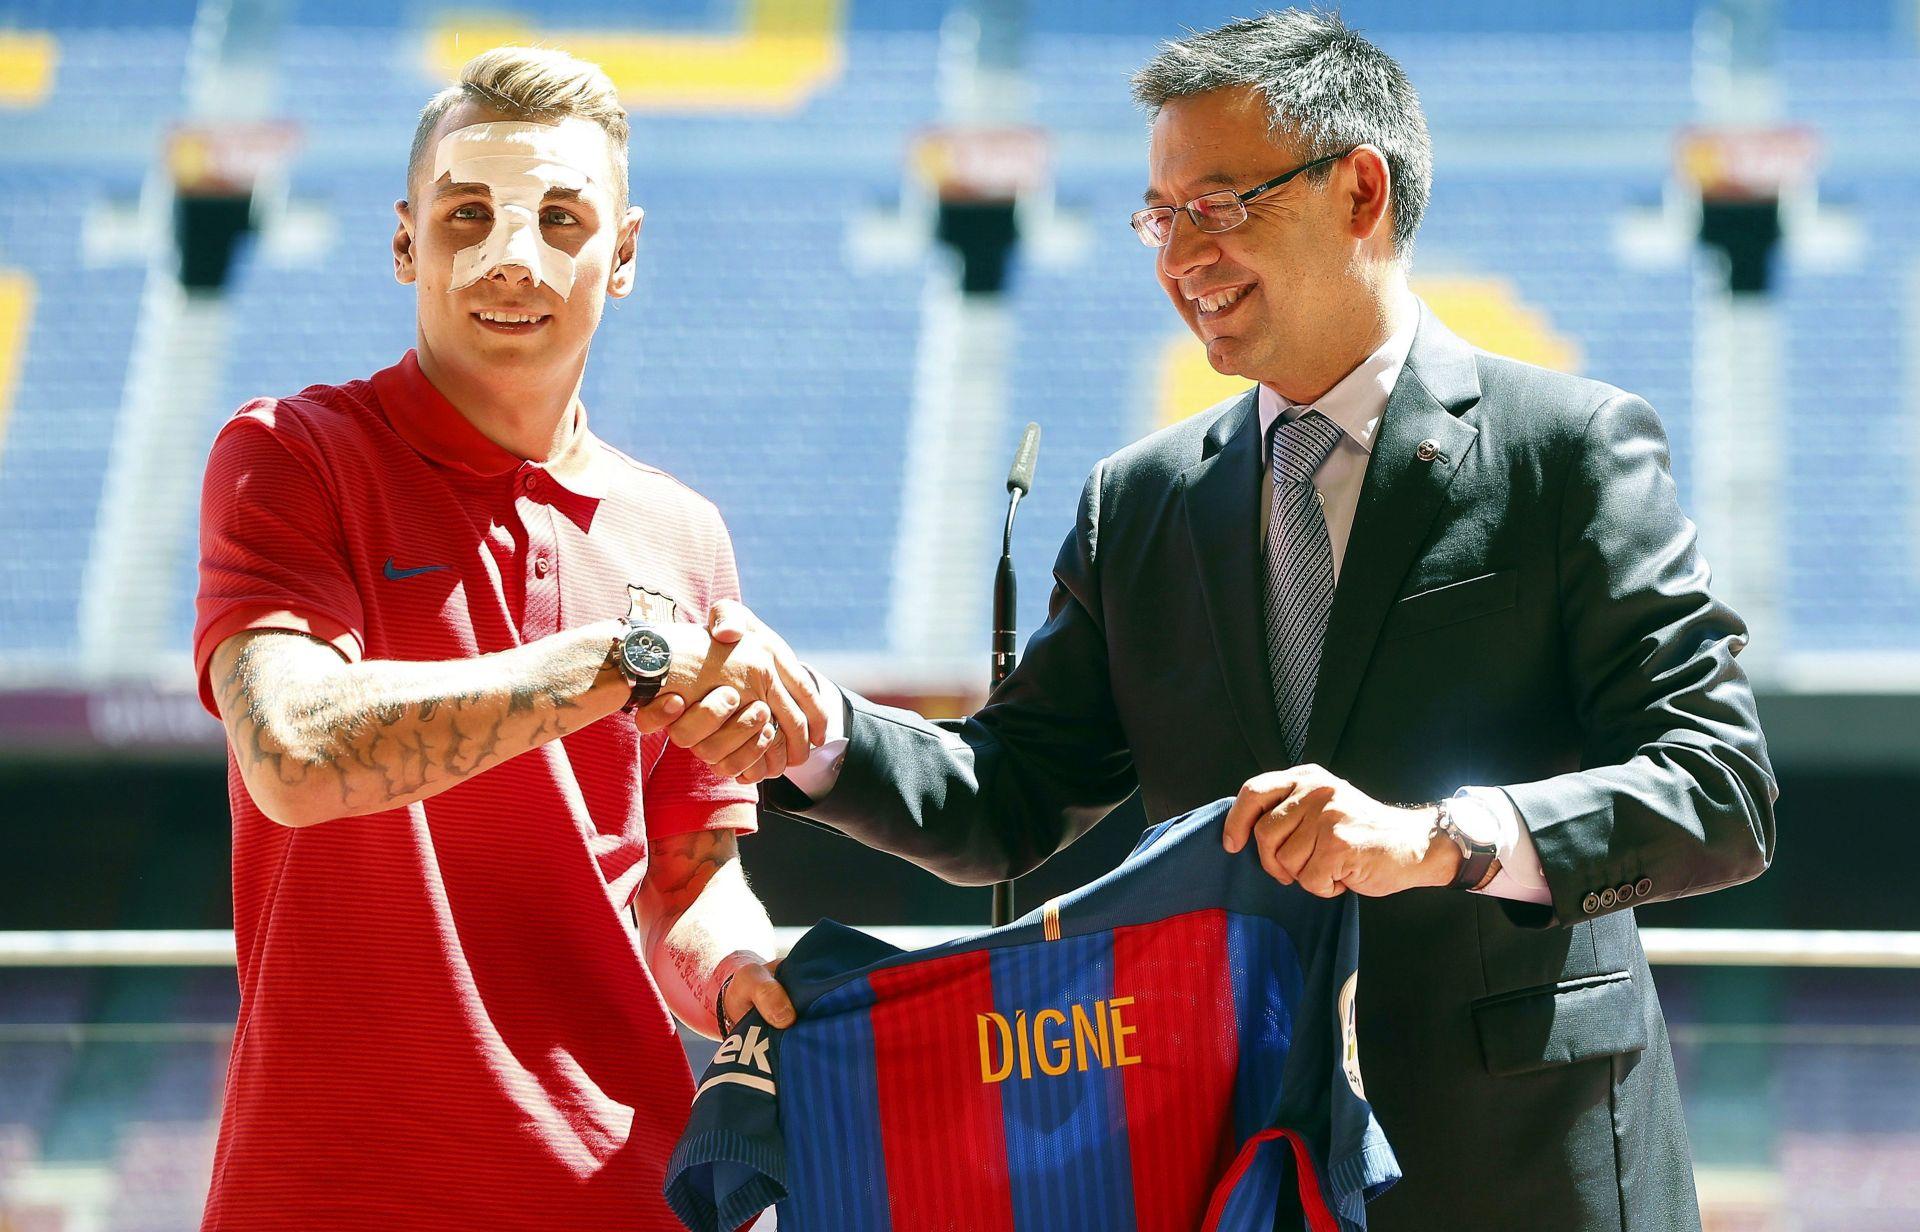 JOŠ JEDAN FRANCUZ NA NOU CAMPU Lucas Digne novi nogometaš Barcelone